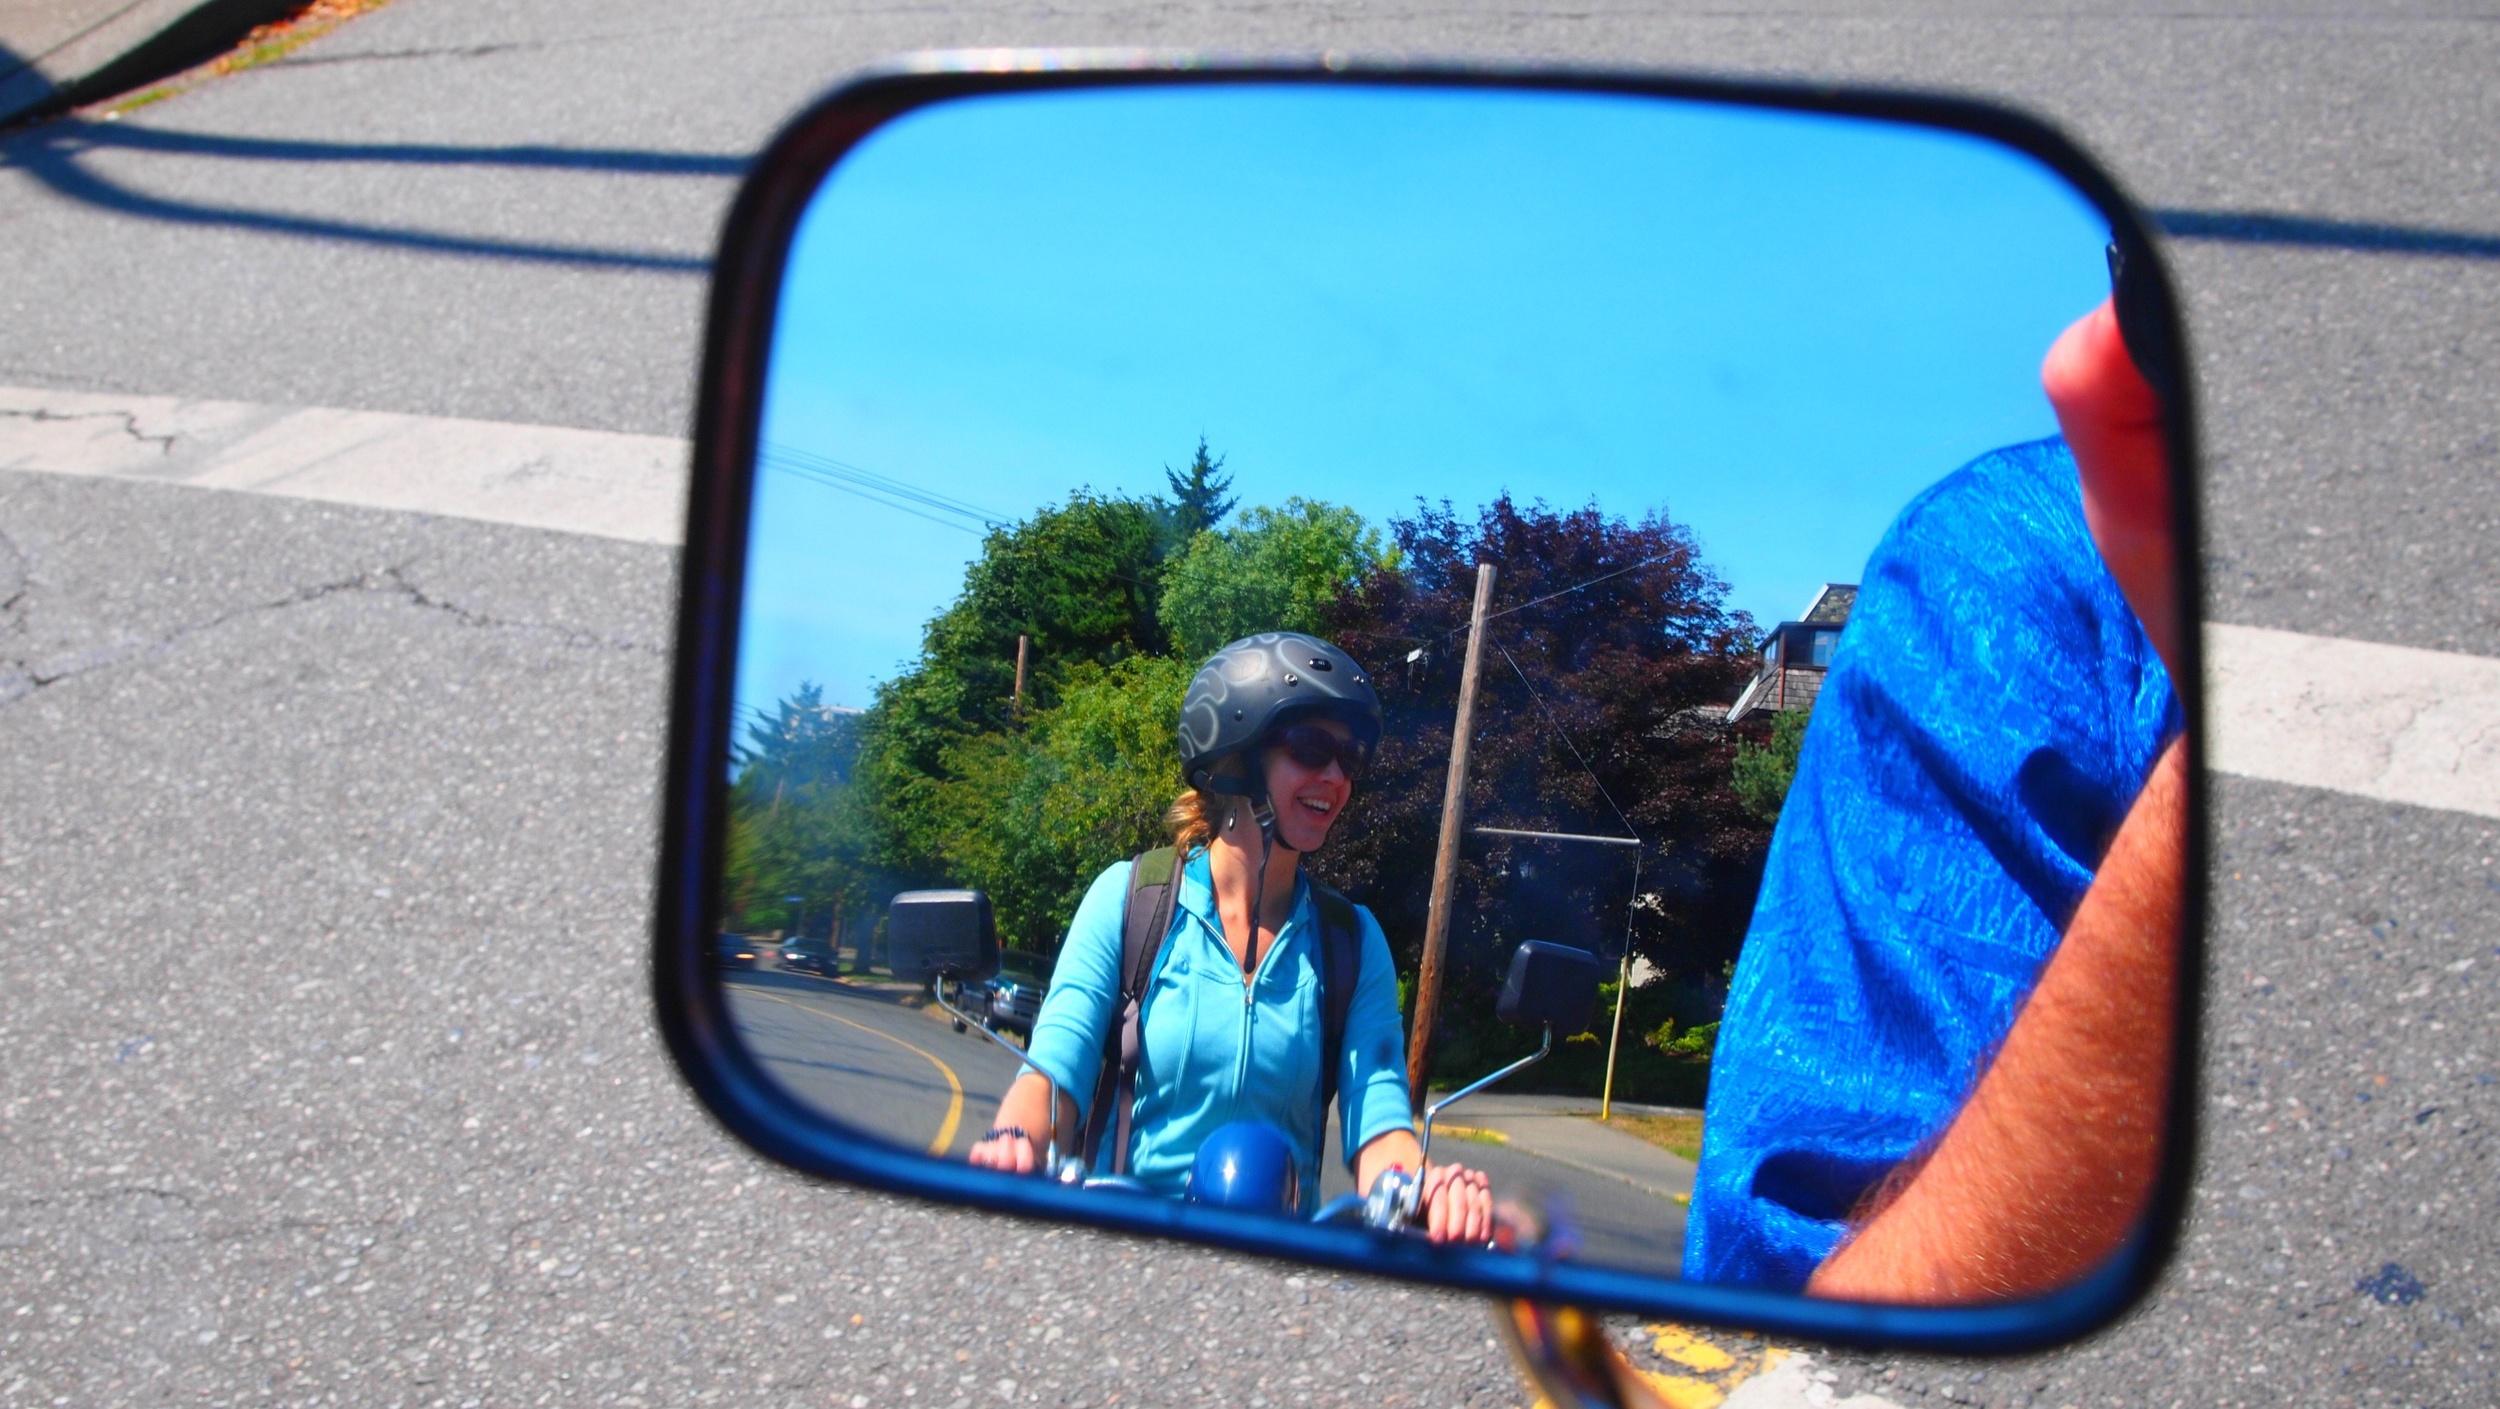 Scooter Ride 27.jpg